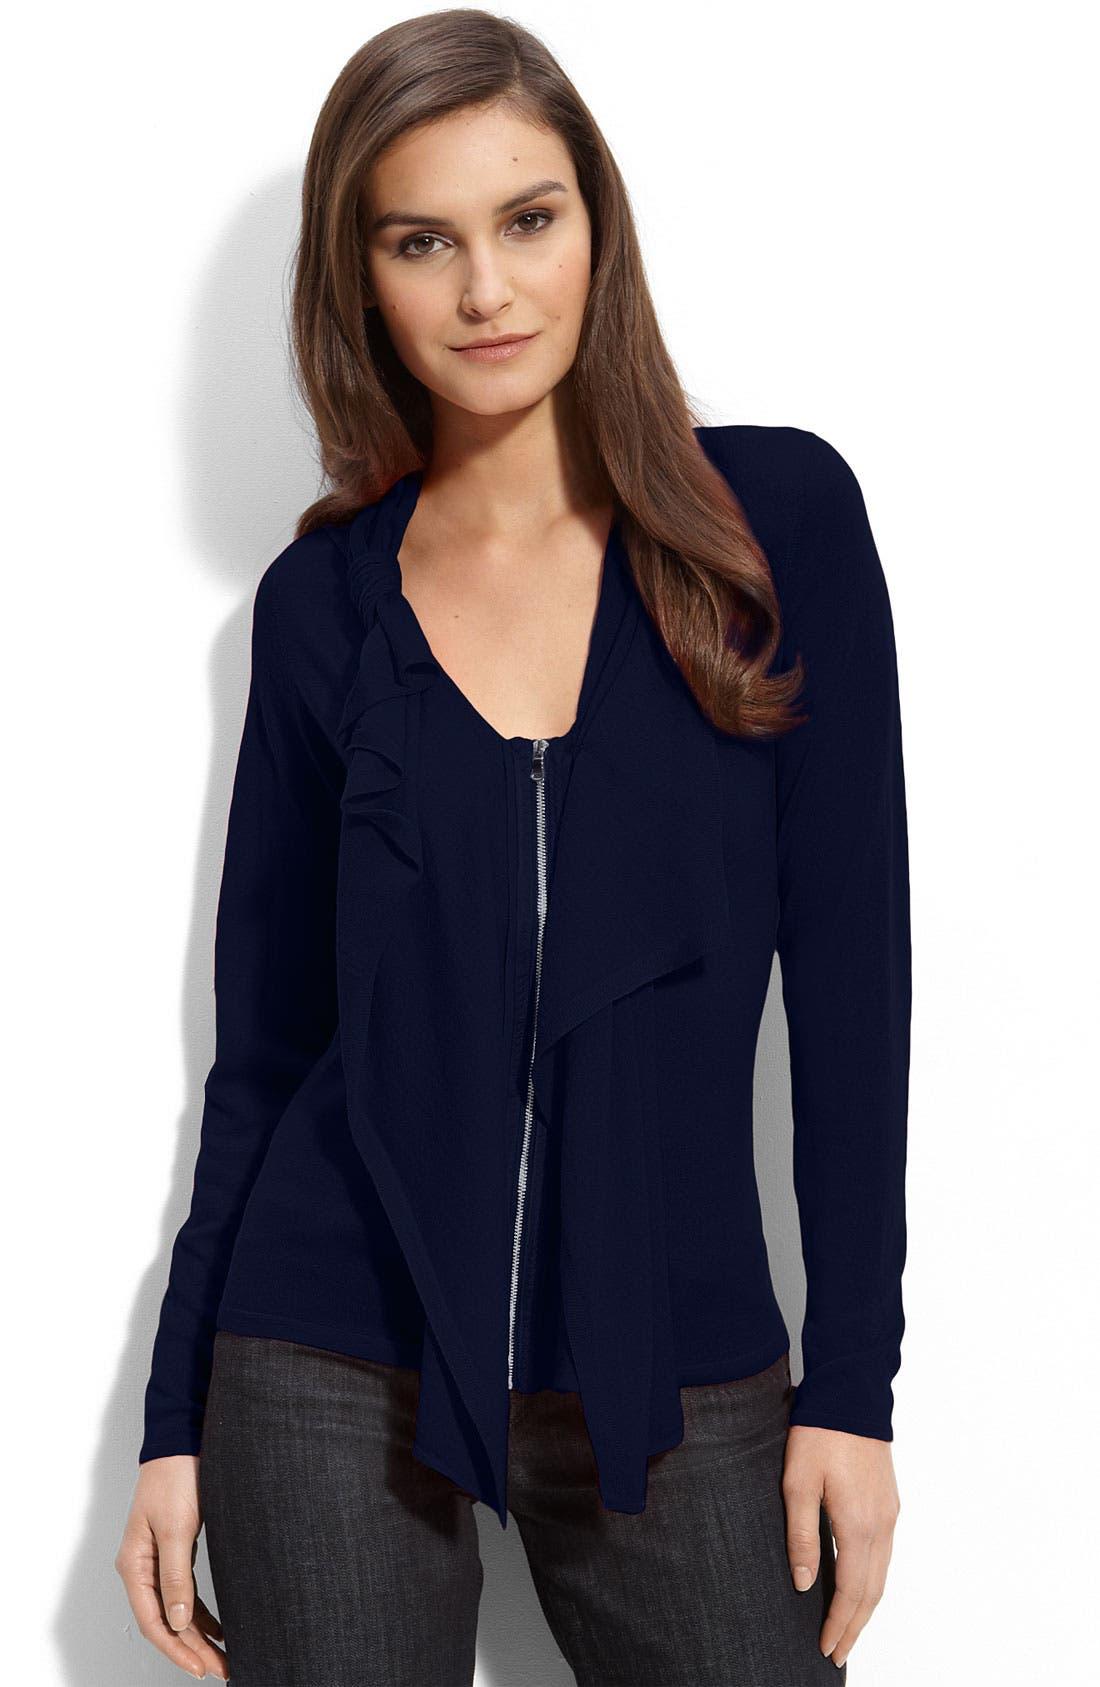 Alternate Image 1 Selected - Elie Tahari 'Lydia' Merino Wool Sweater